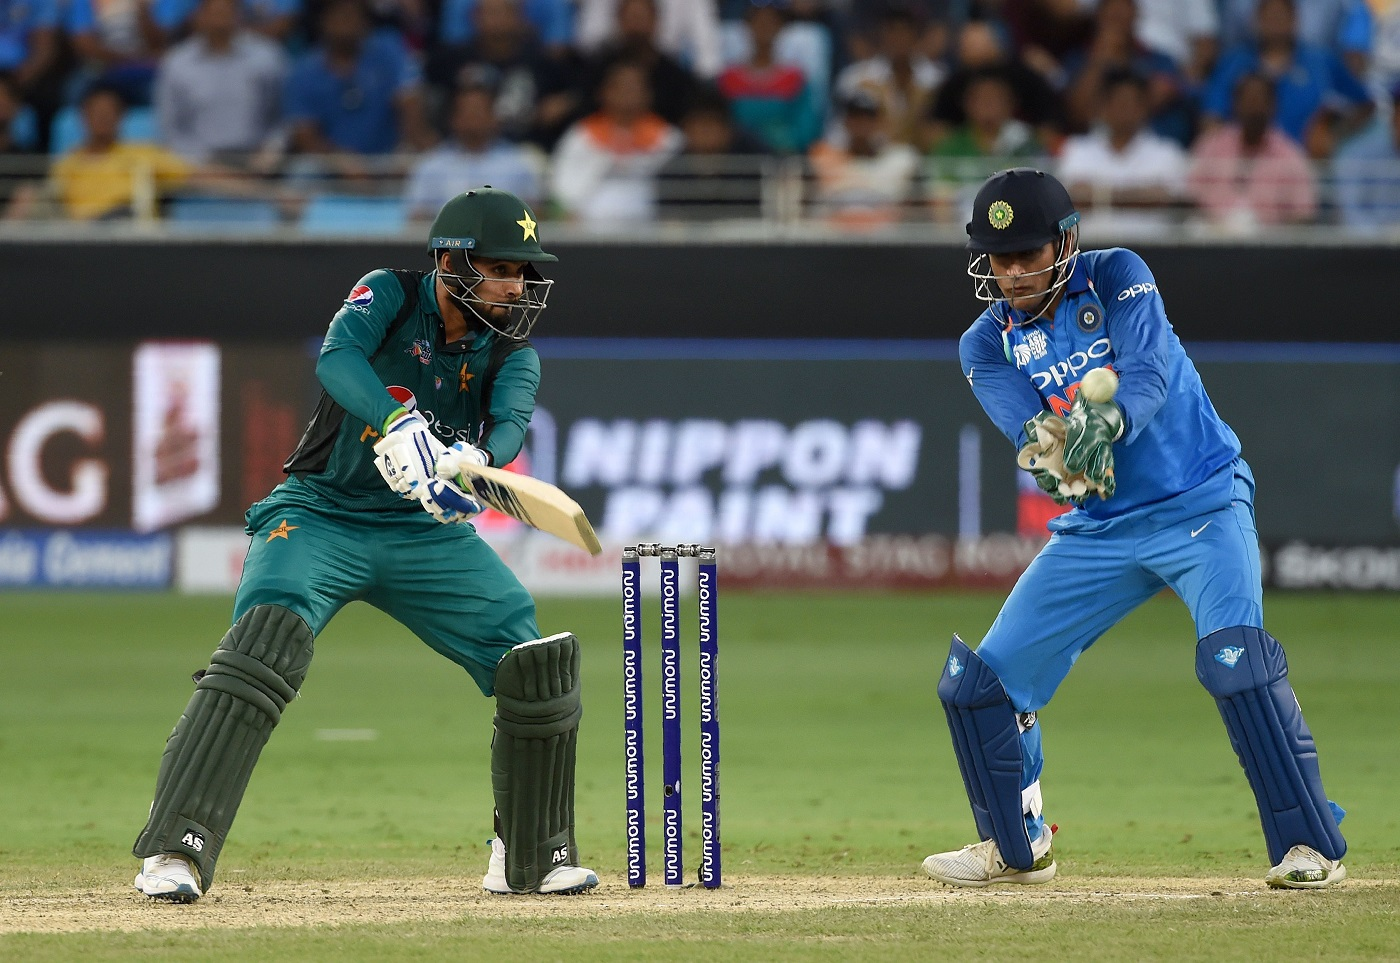 Asia Cup 2018, India vs Pakistan, Rashid Latif